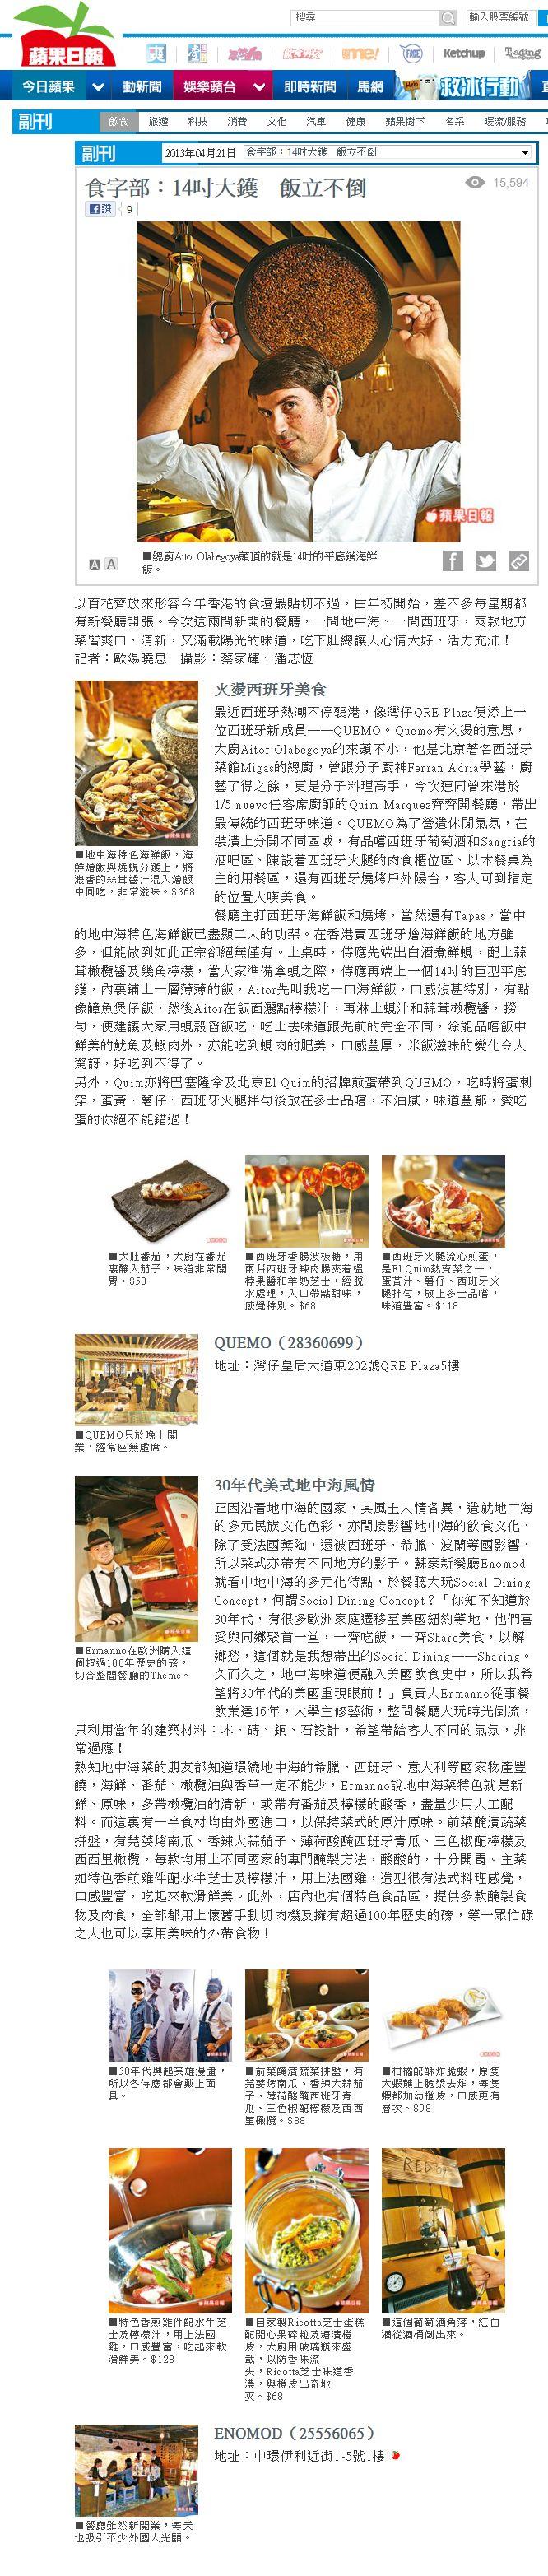 ENOMOD - 21.04 - Apple Daily (online).jpg